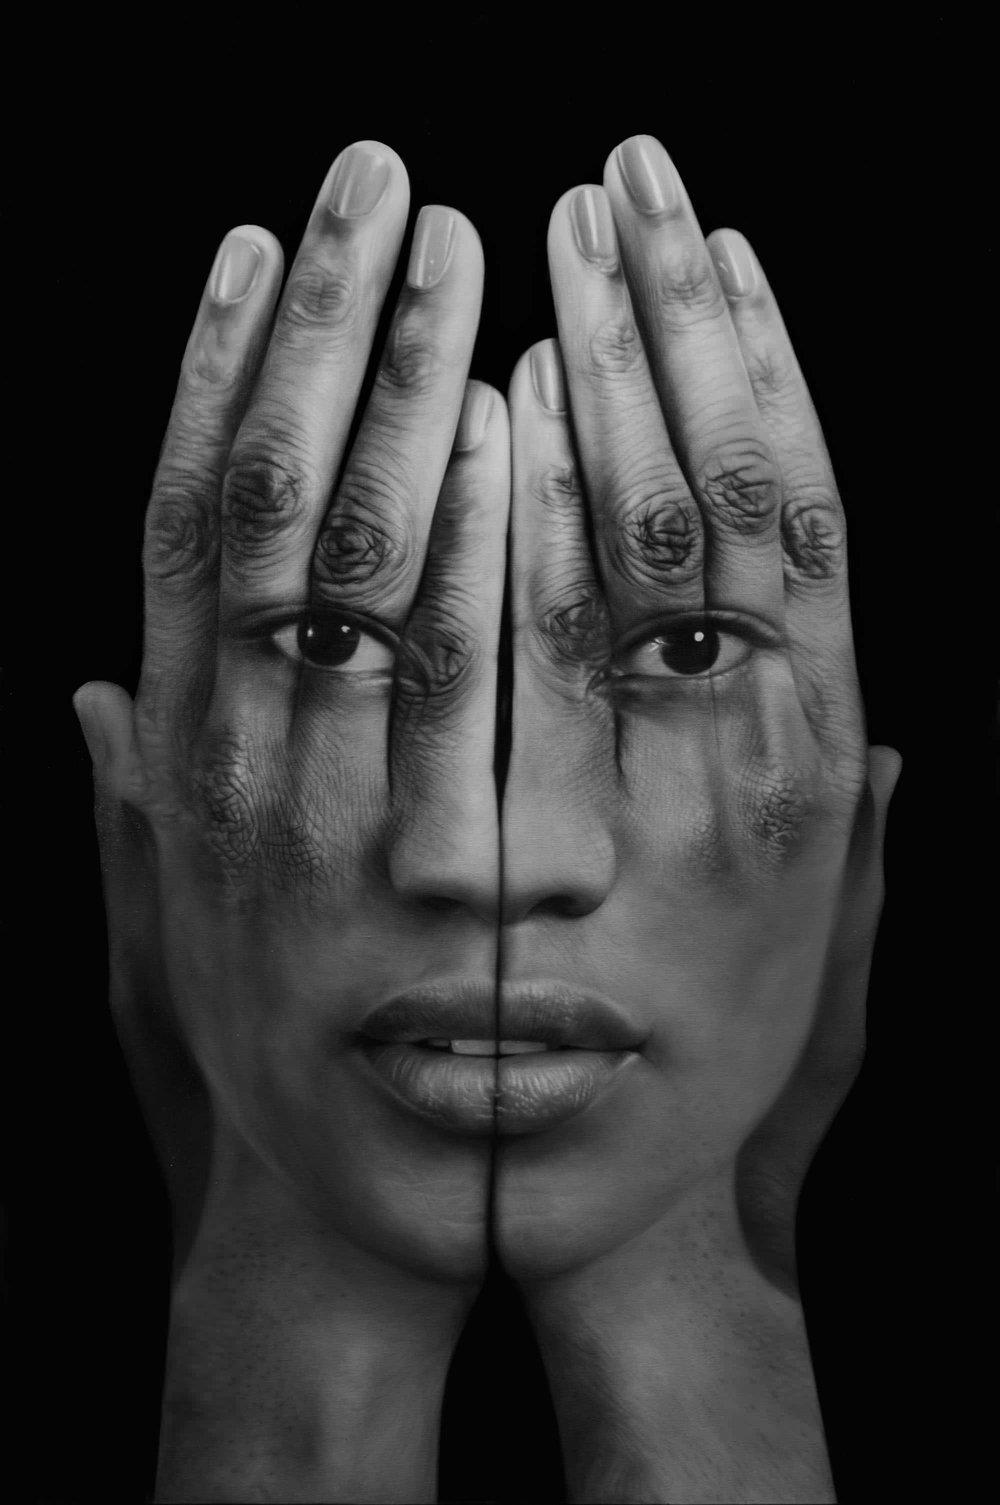 Tigran Tsitoghdzya, Black Mirror, 2013, Olio su tela 190x127 cm. photo by  Tigran Tsitoghdzya